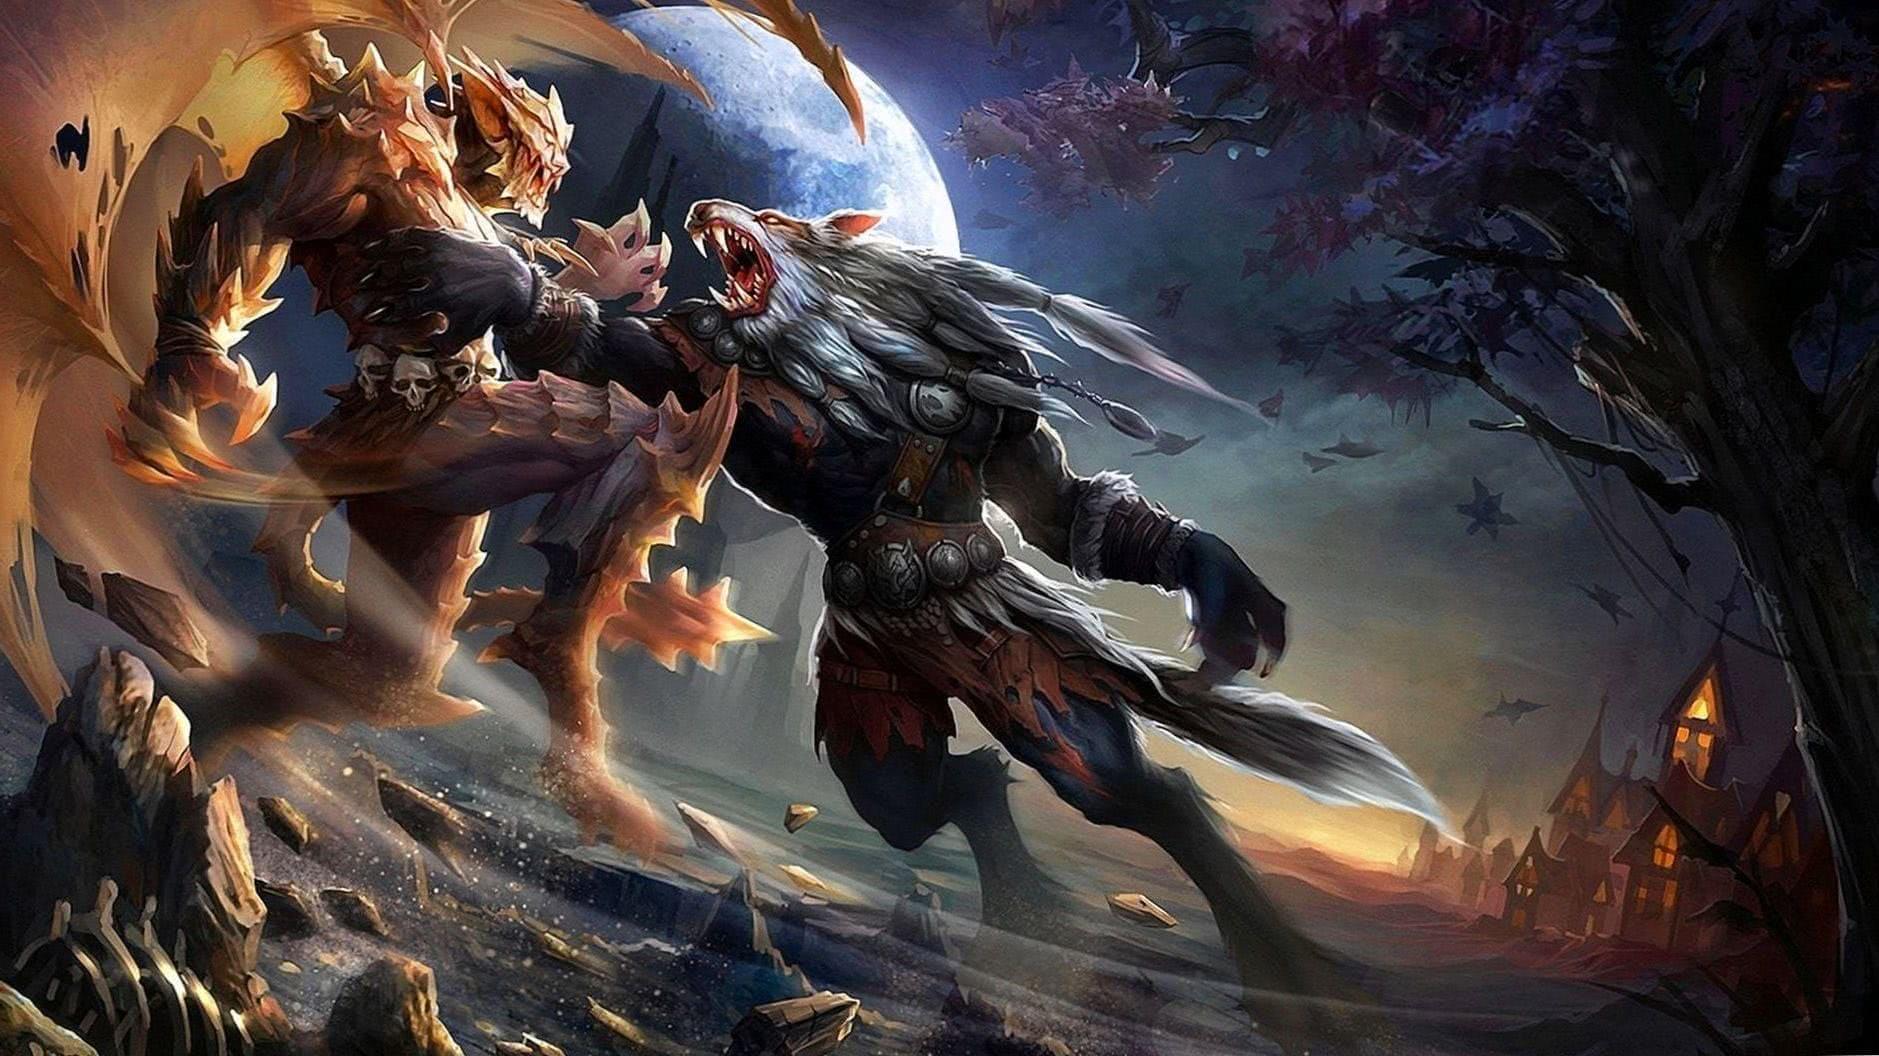 Vampire Werewolf HD Wallpapers